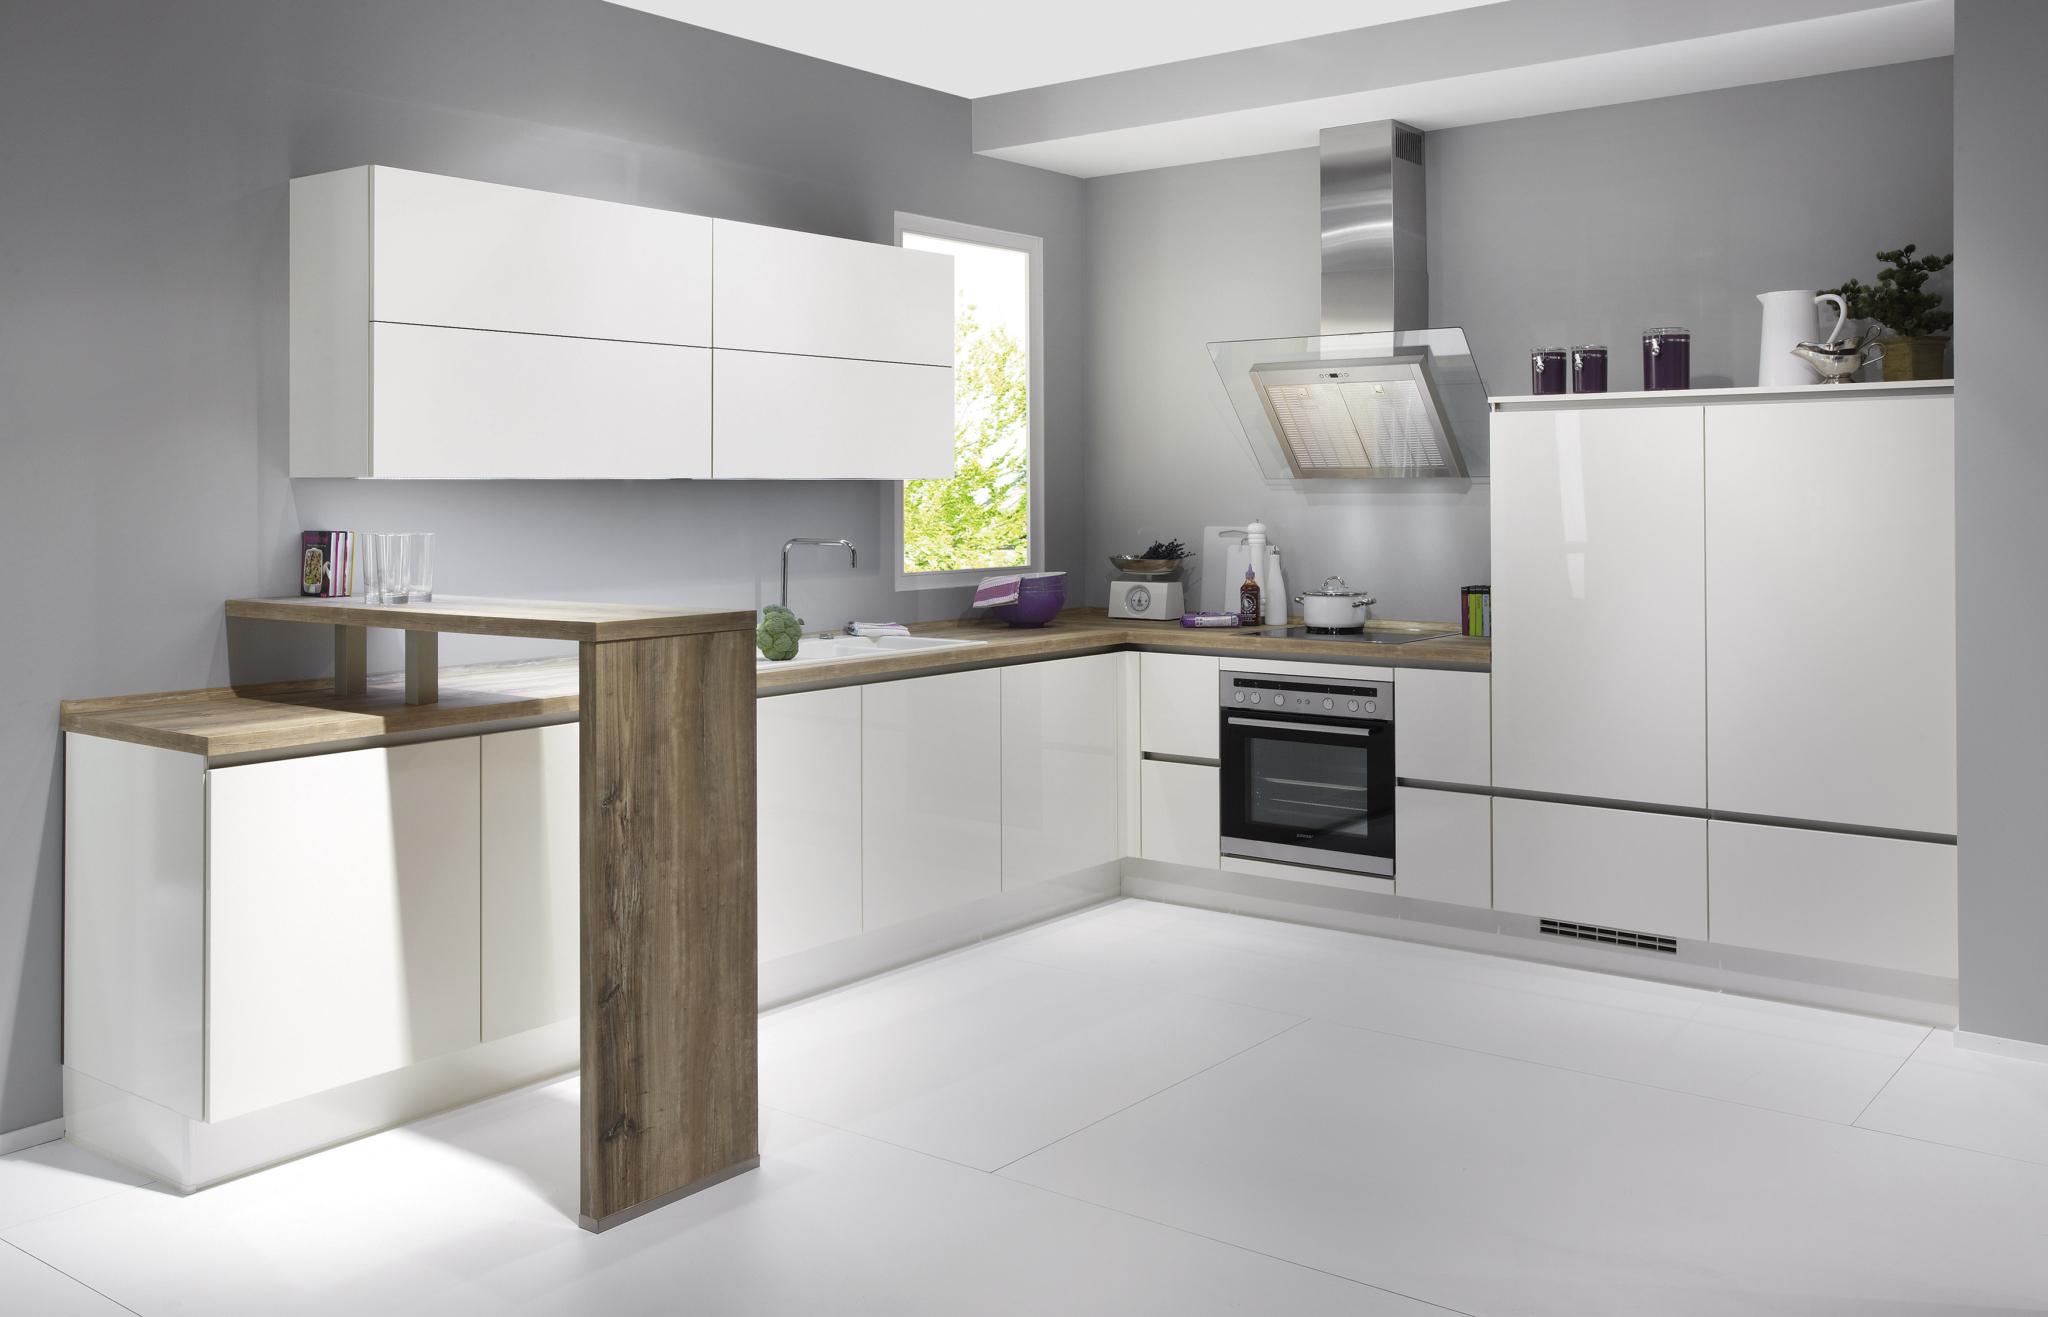 Cocinas modernas muebles hermanos p rez Fotos para cocina